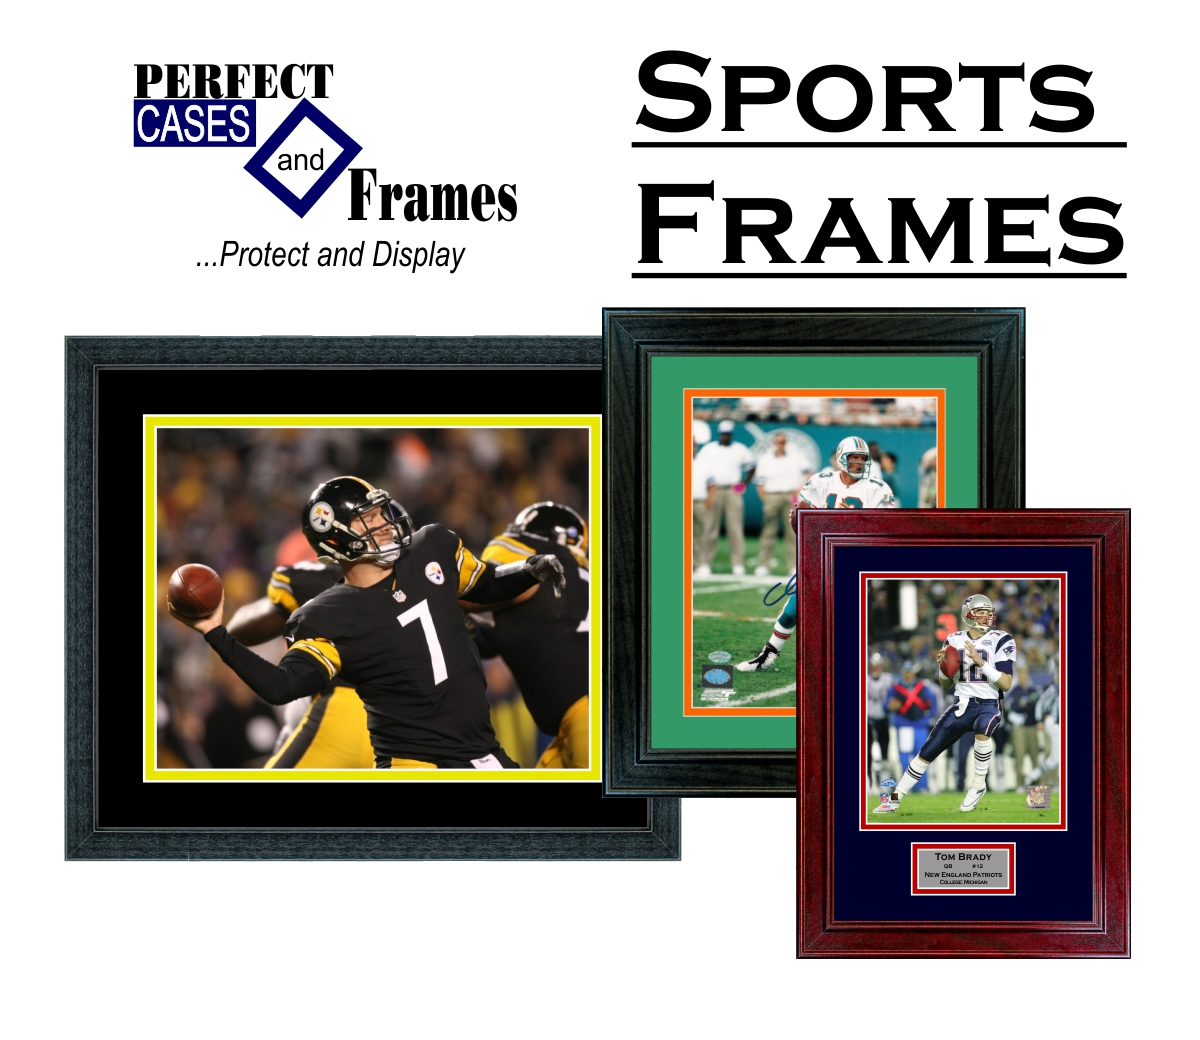 sports-frames.jpg